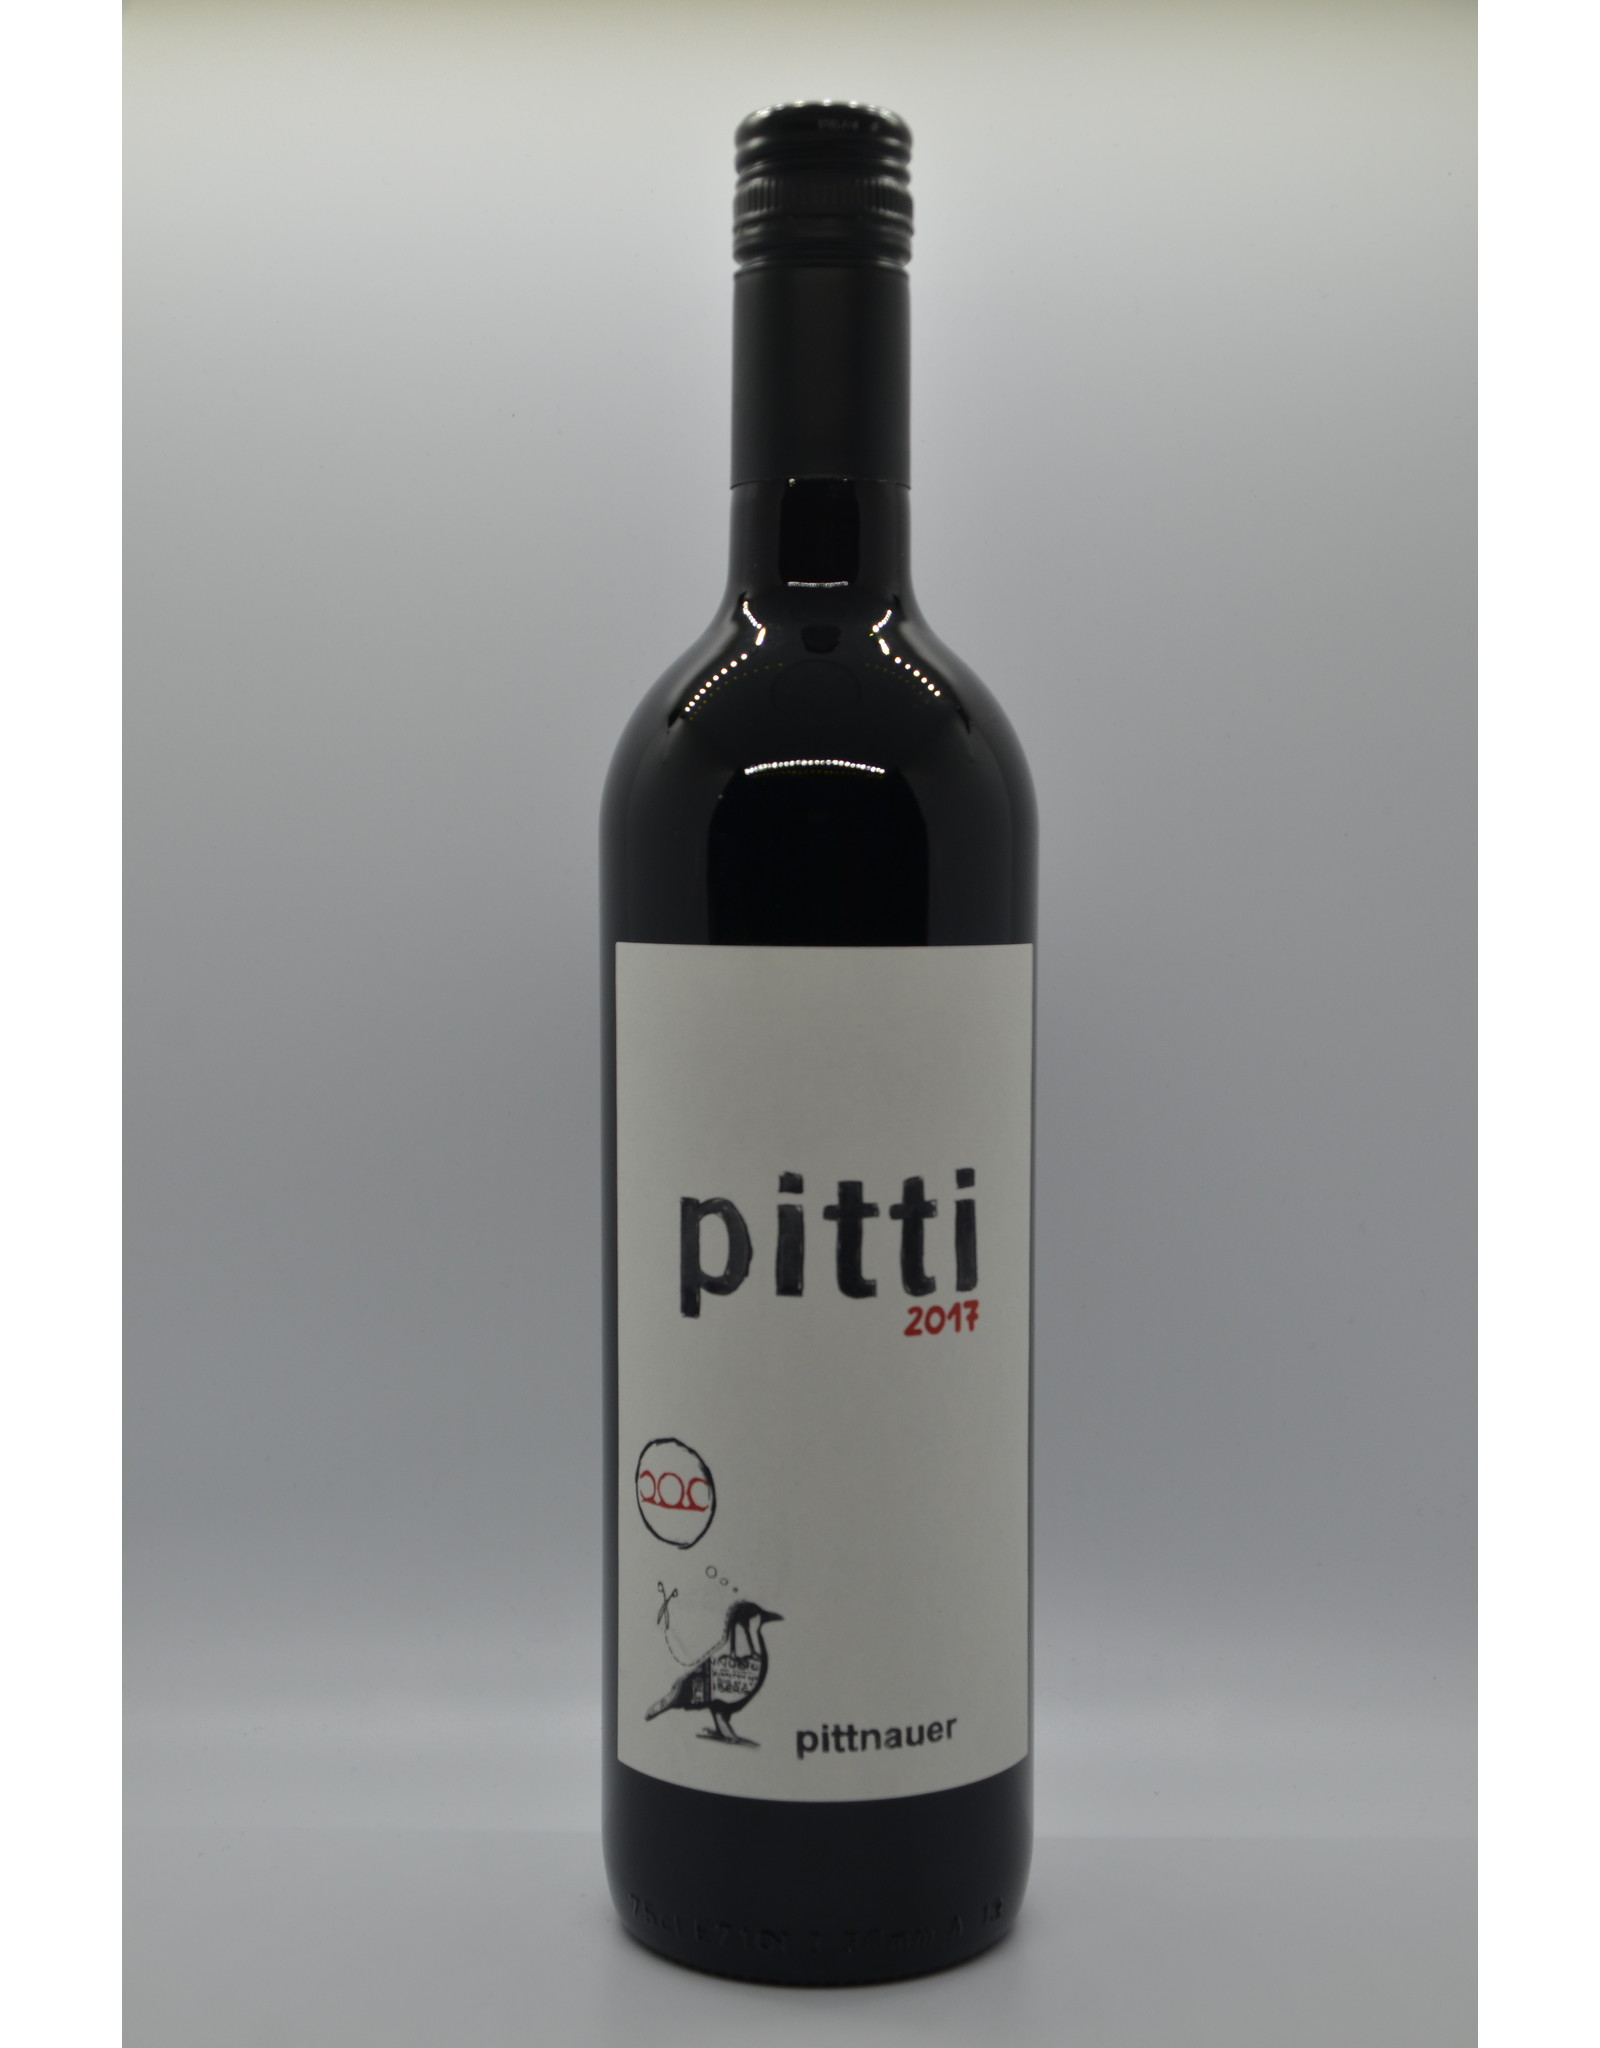 Austria Pittnauer Pitti